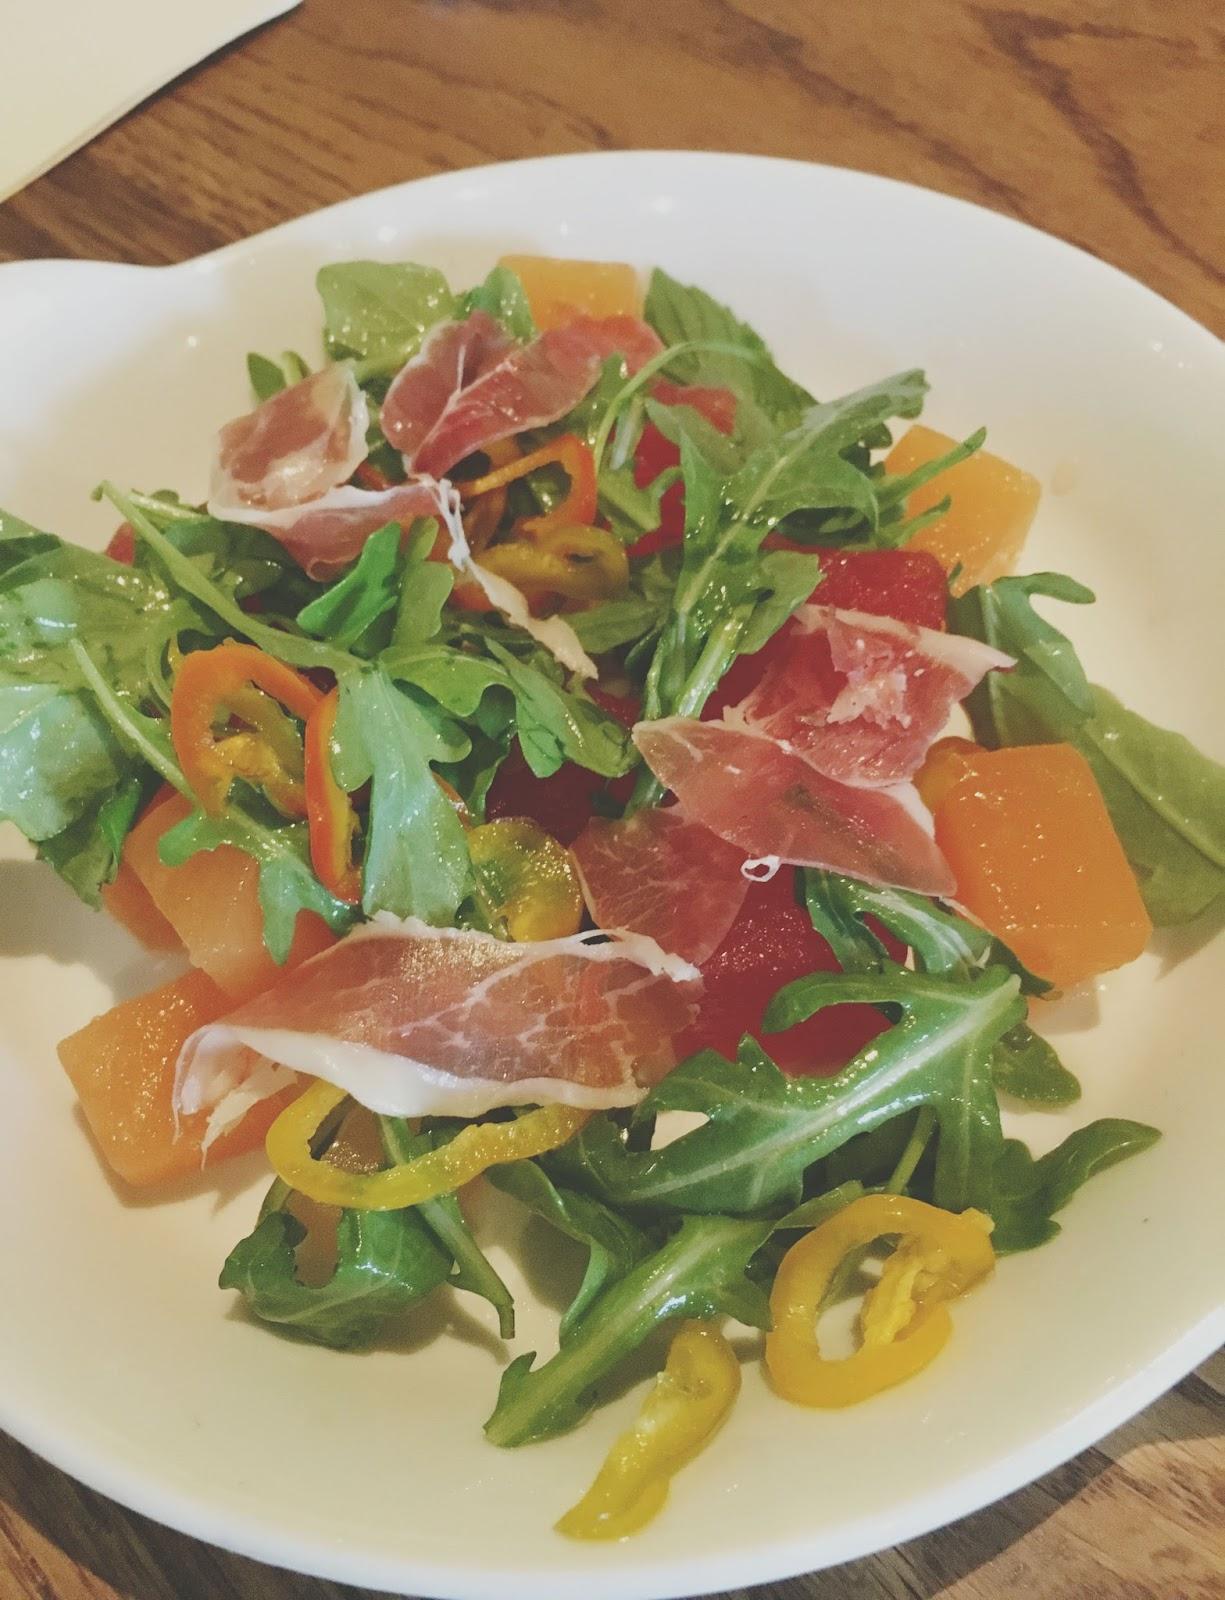 ham & melon salad at Hunky Dory - A restaurant in Houston, Texas